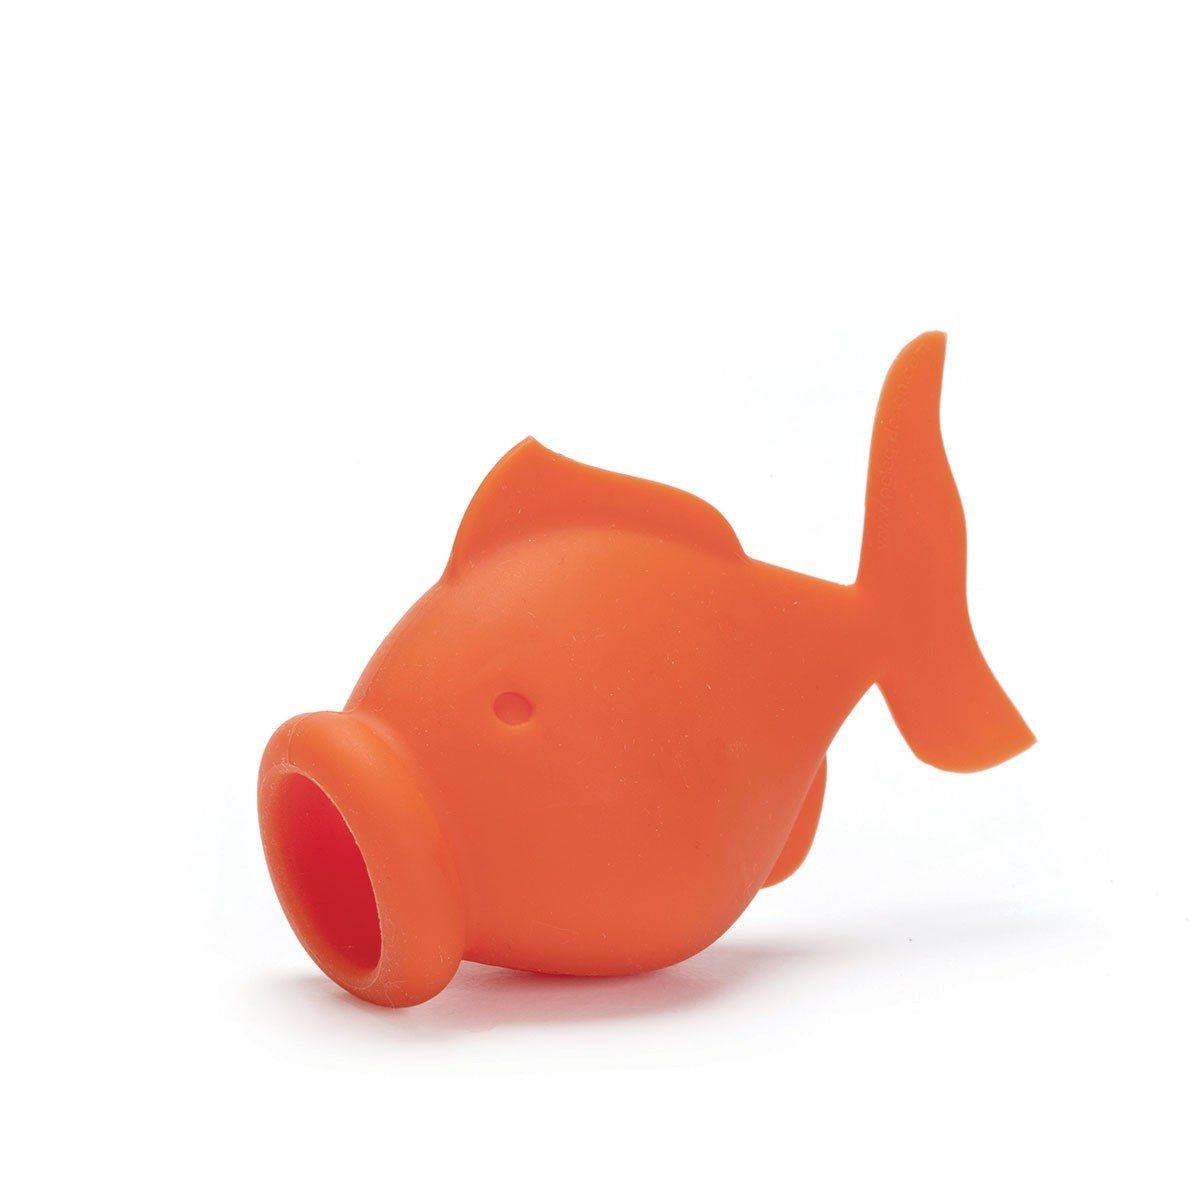 Eigeelscheider vis – perfecte oplossing bij eieren scheiden